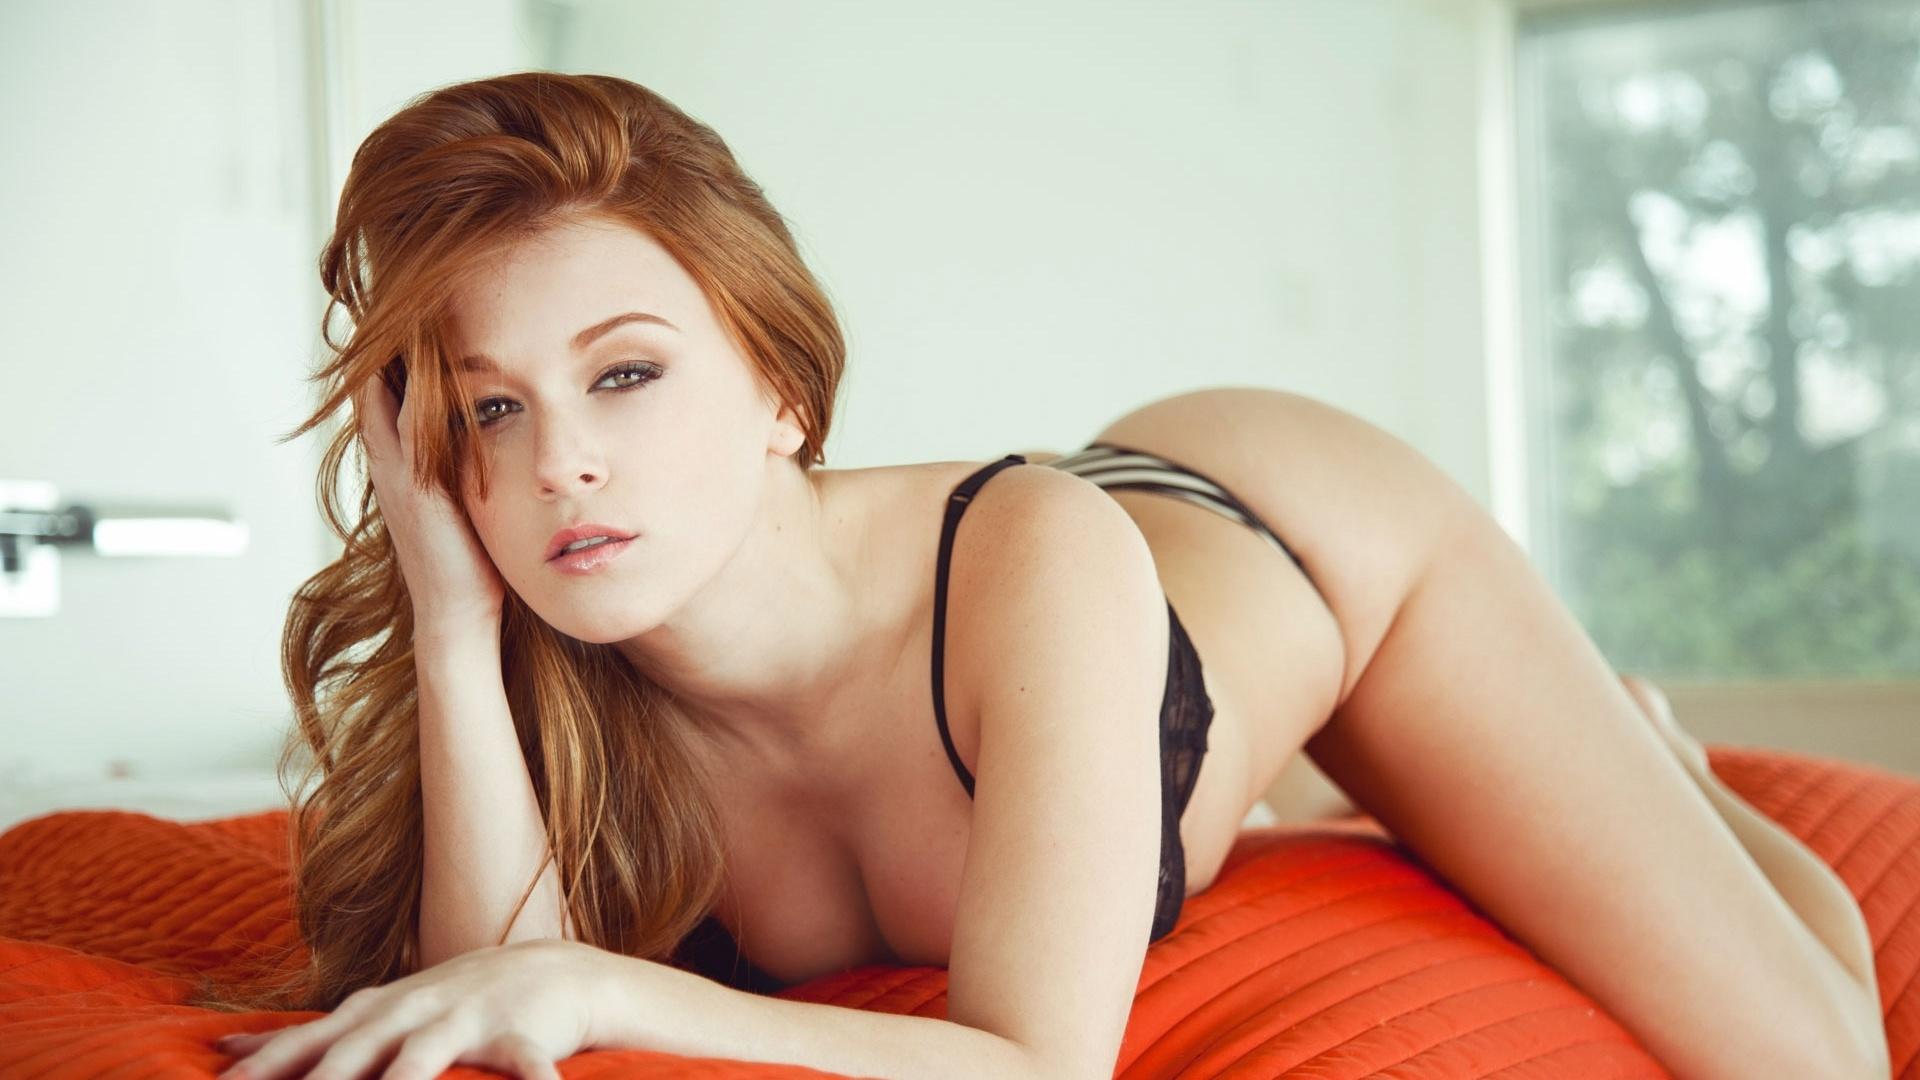 Kareena xxx nude picture